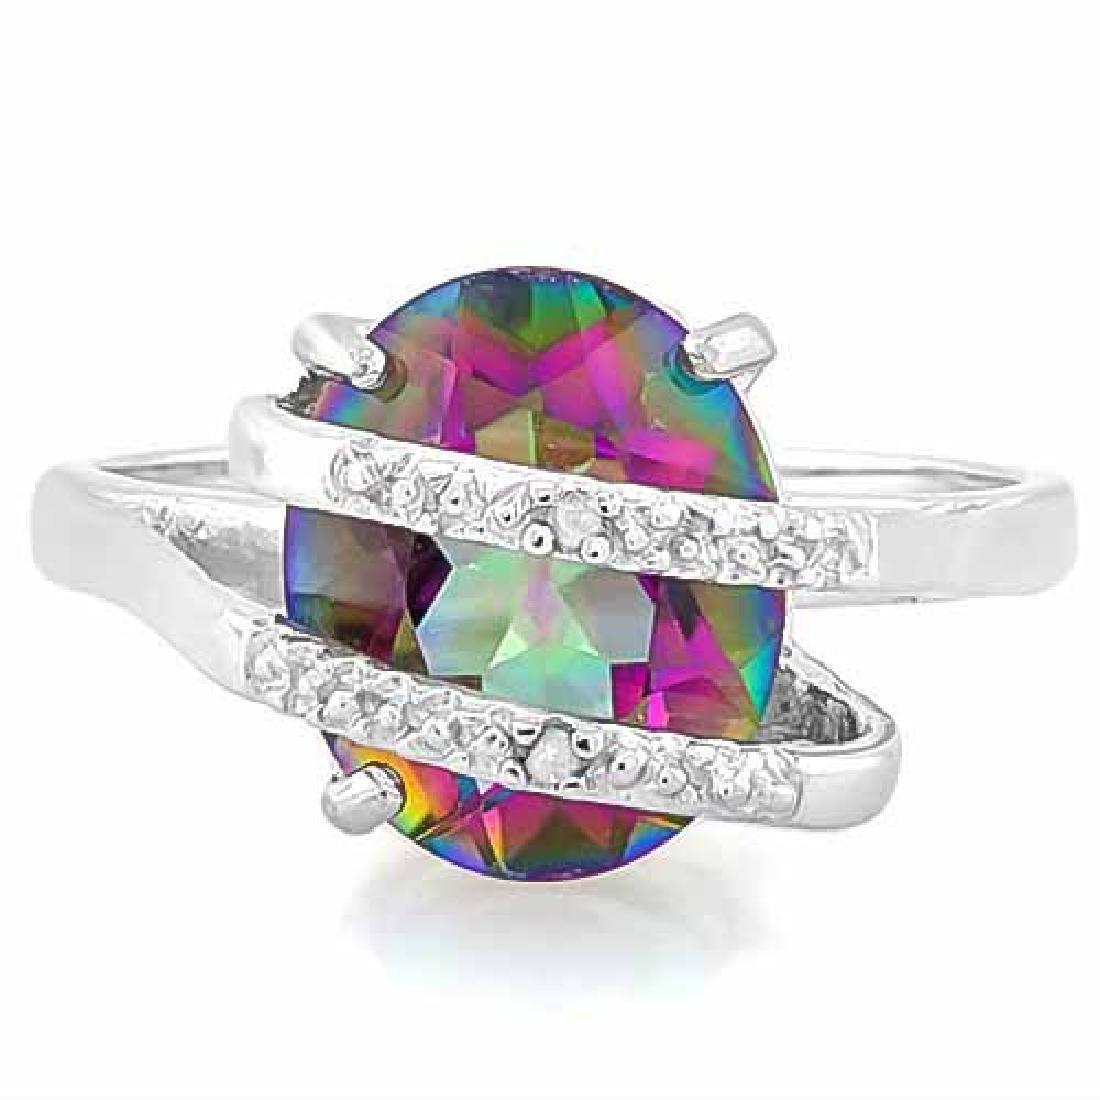 3 1/5 CARAT MYSTIC GEMSTONE & DIAMOND 925 STERLING SILV